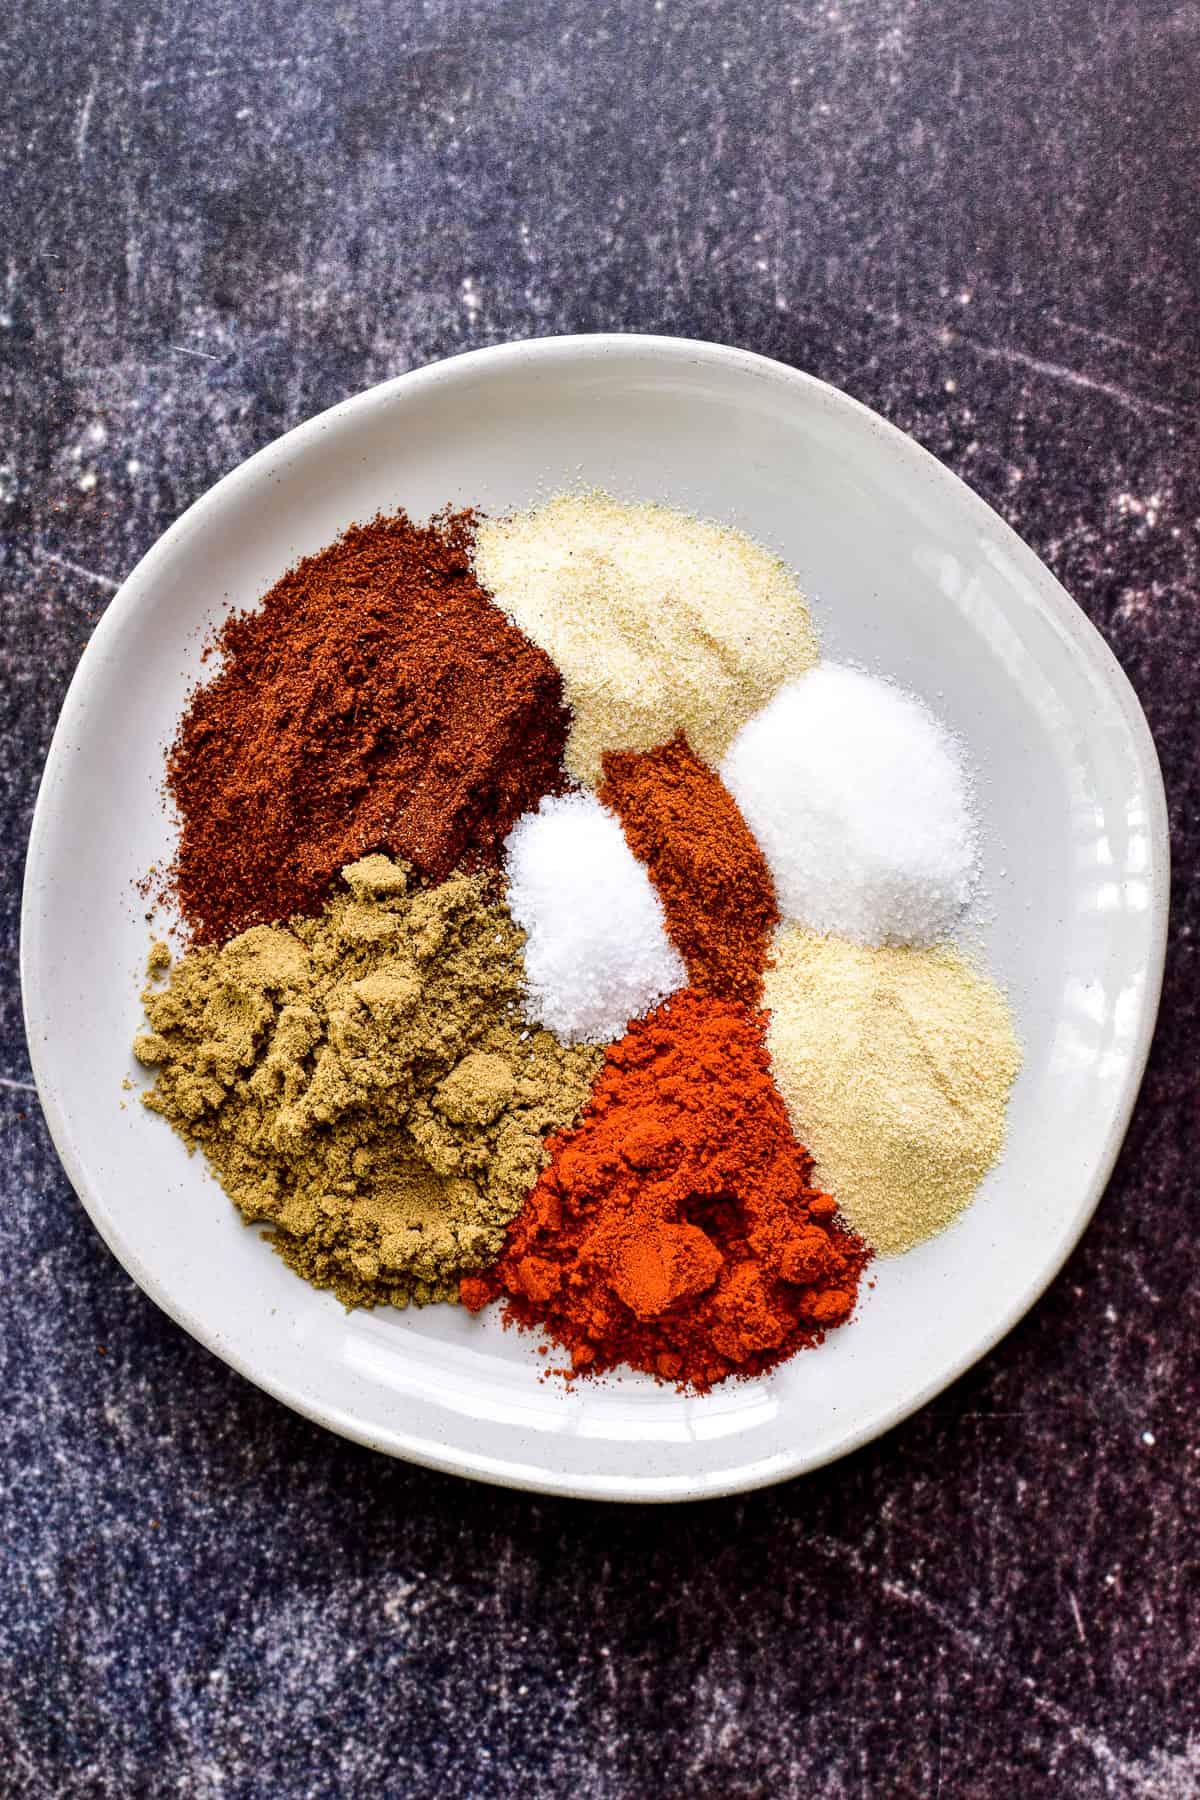 Overhead photo of Fajita Seasoning spices on a white plate